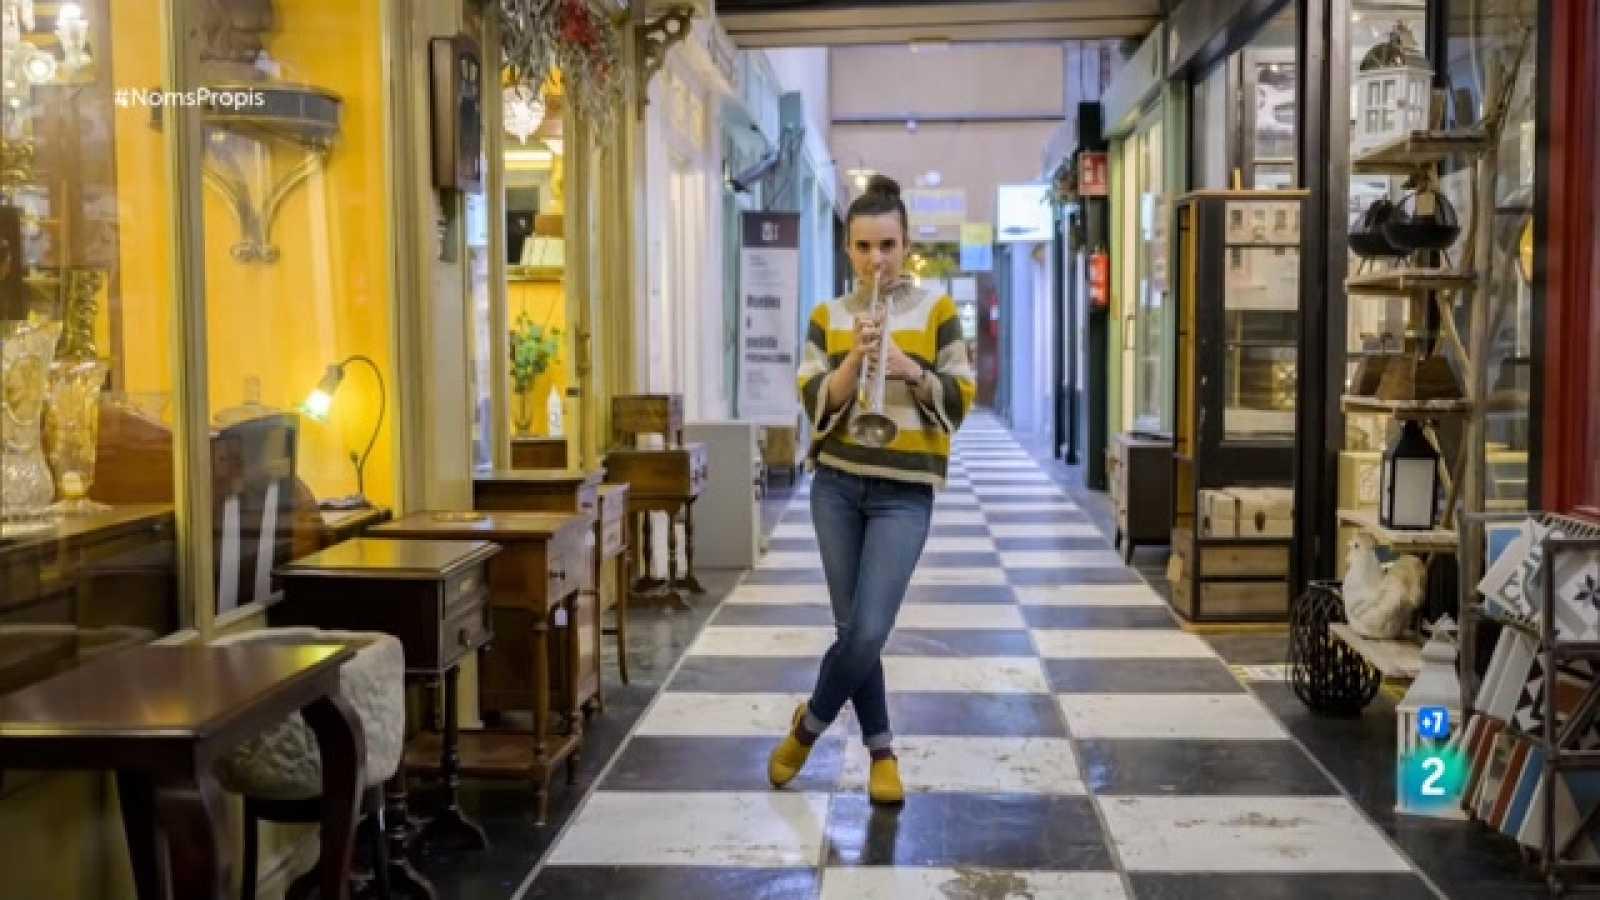 Andrea Motis entrevistada per Anna Cler a Noms Propis